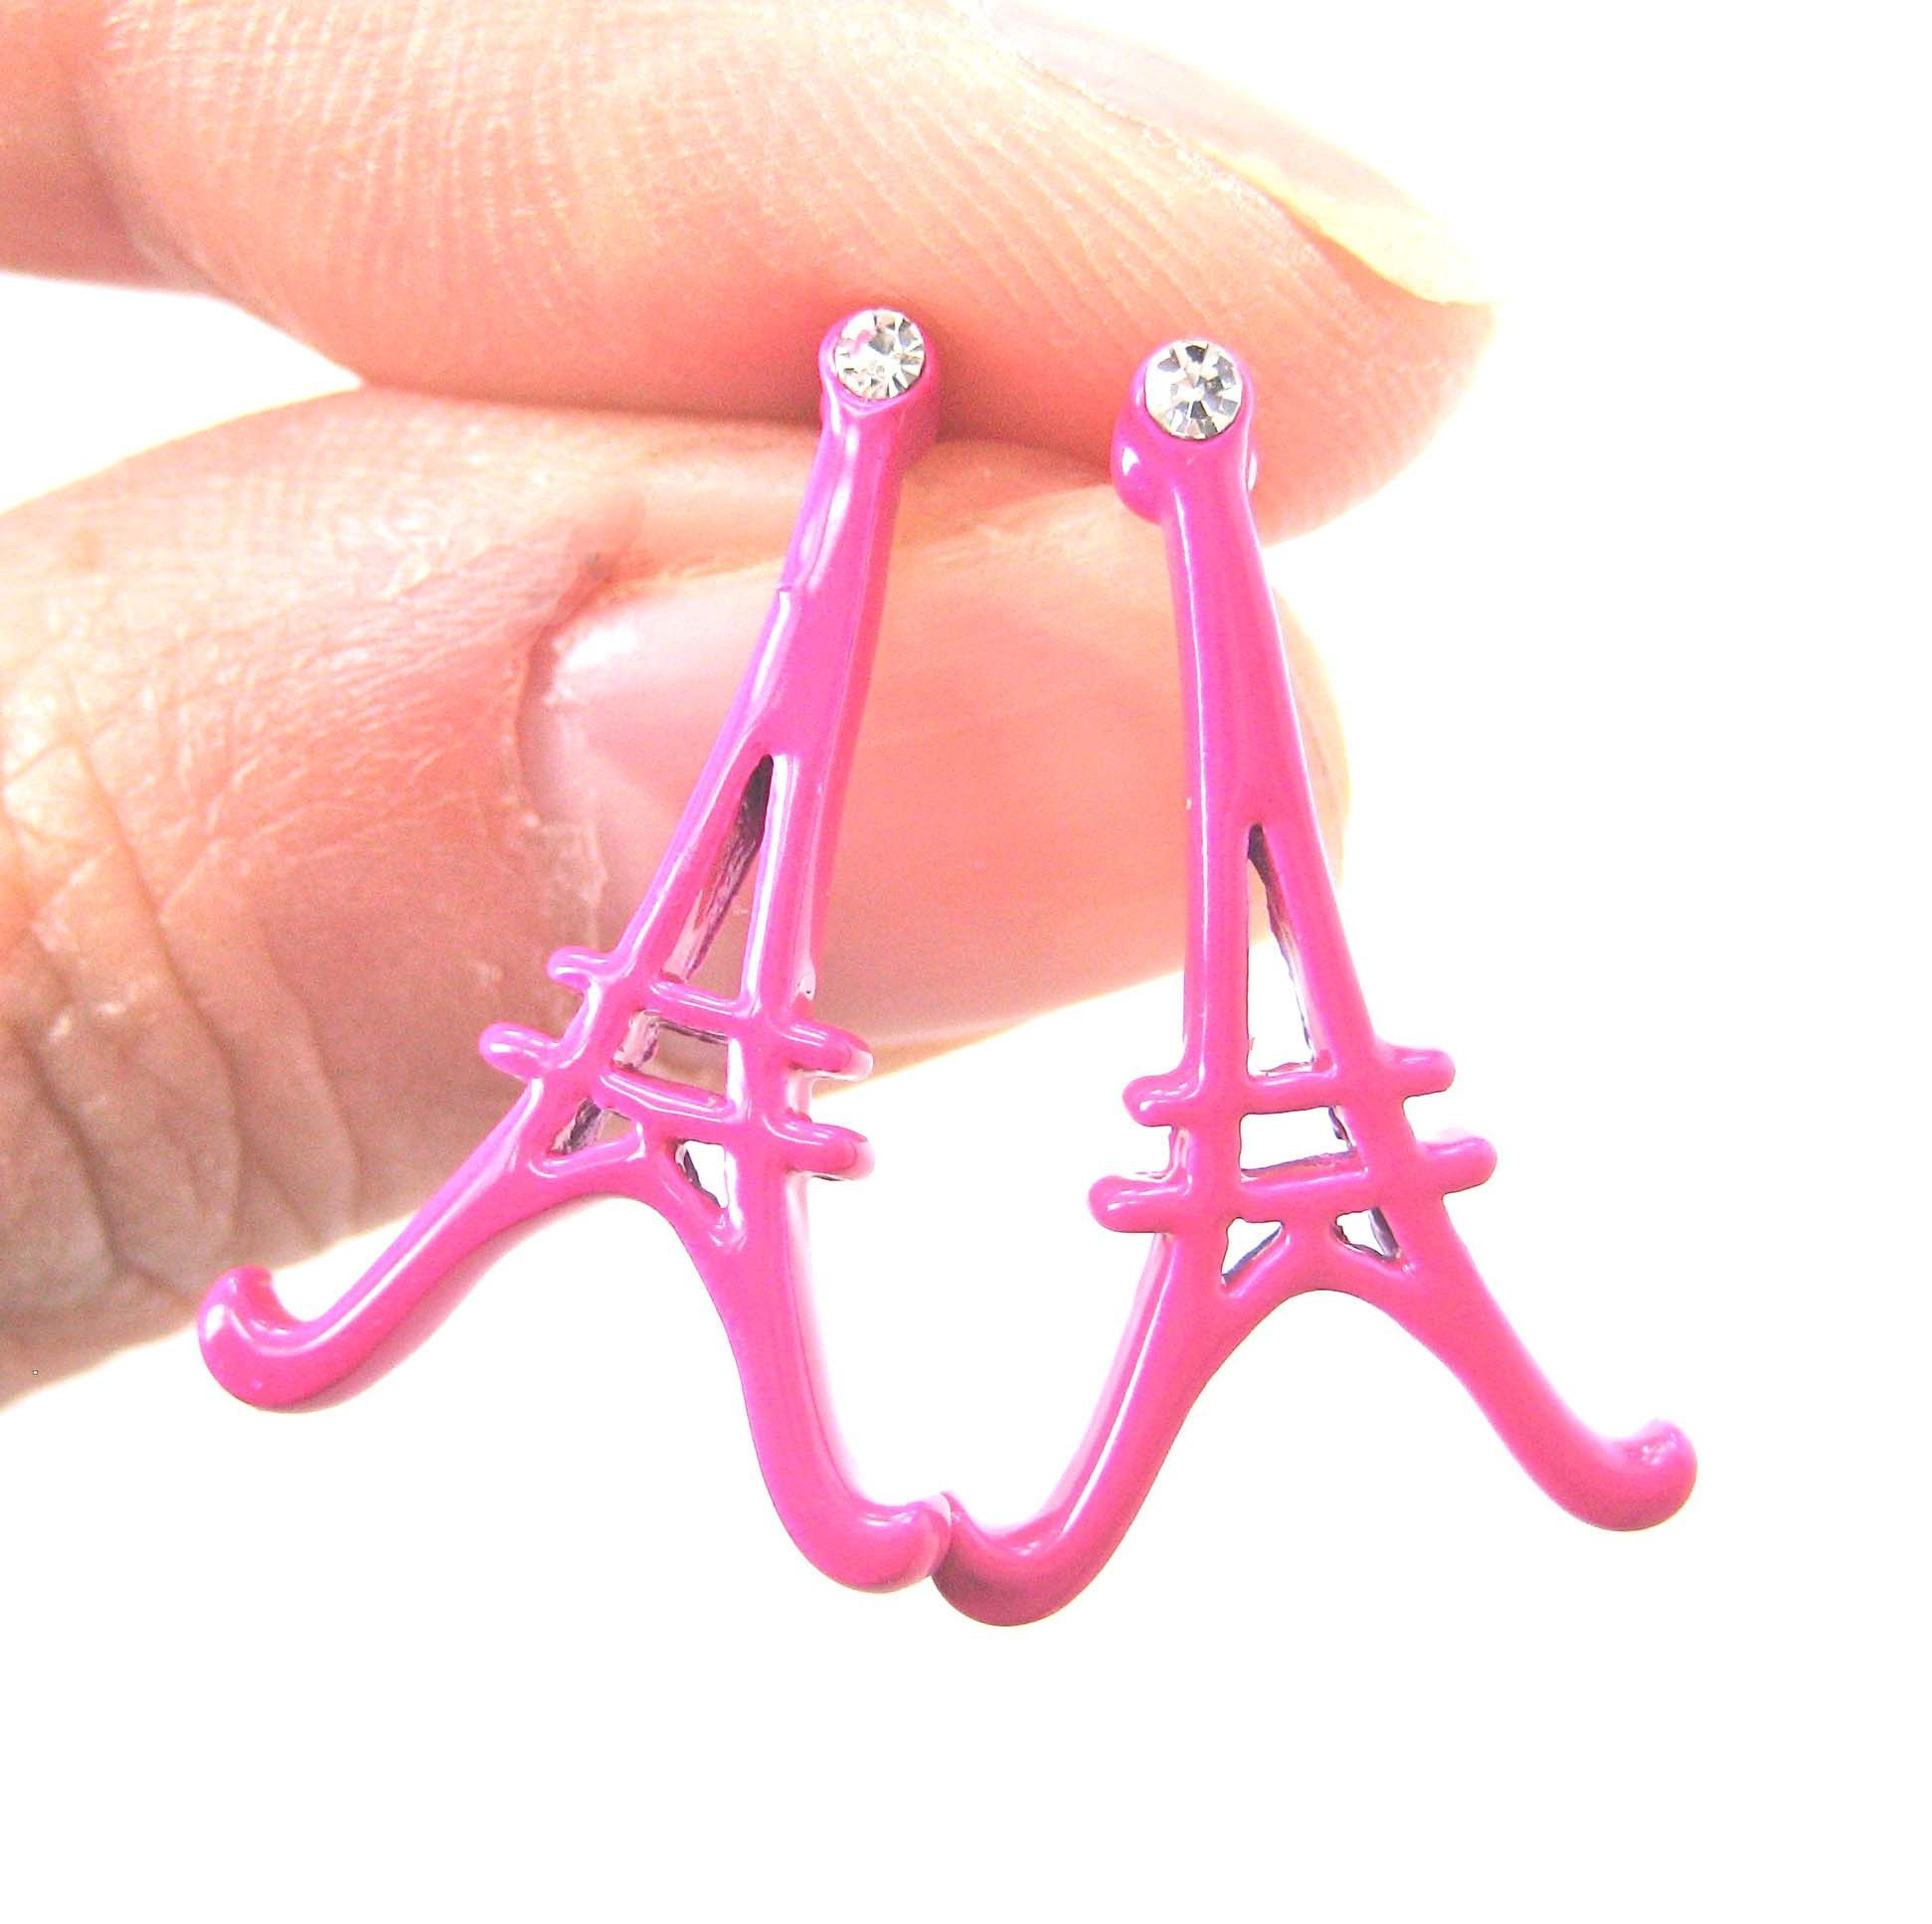 Large Eiffel Tower Shaped Paris France Travel Stud Earrings in Pink